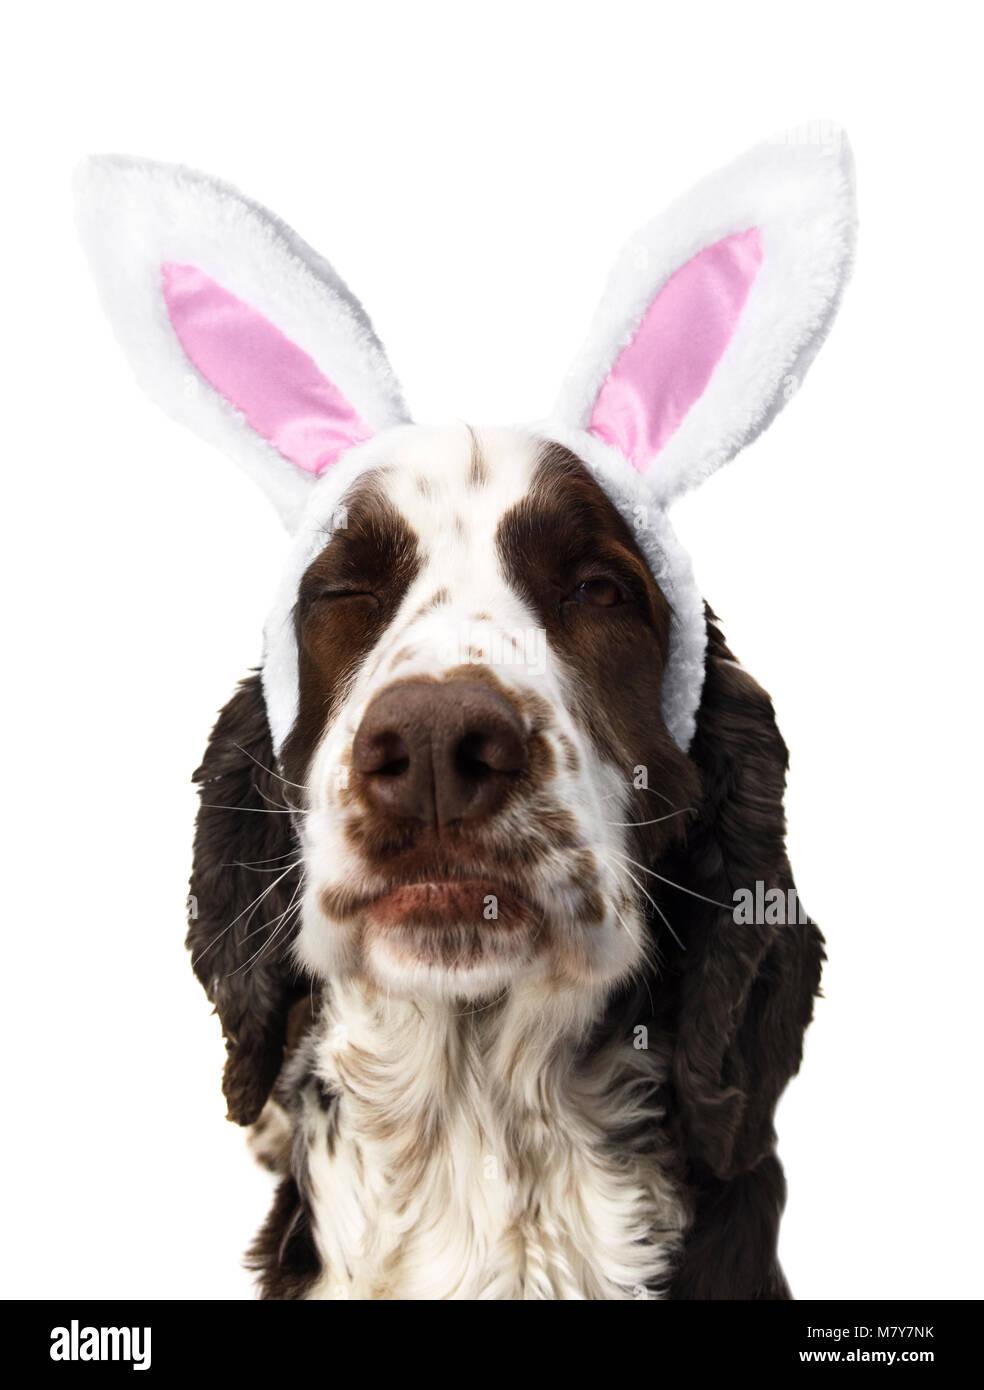 English Springer Spaniel Dog Winking With Bunny Ears - Stock Image